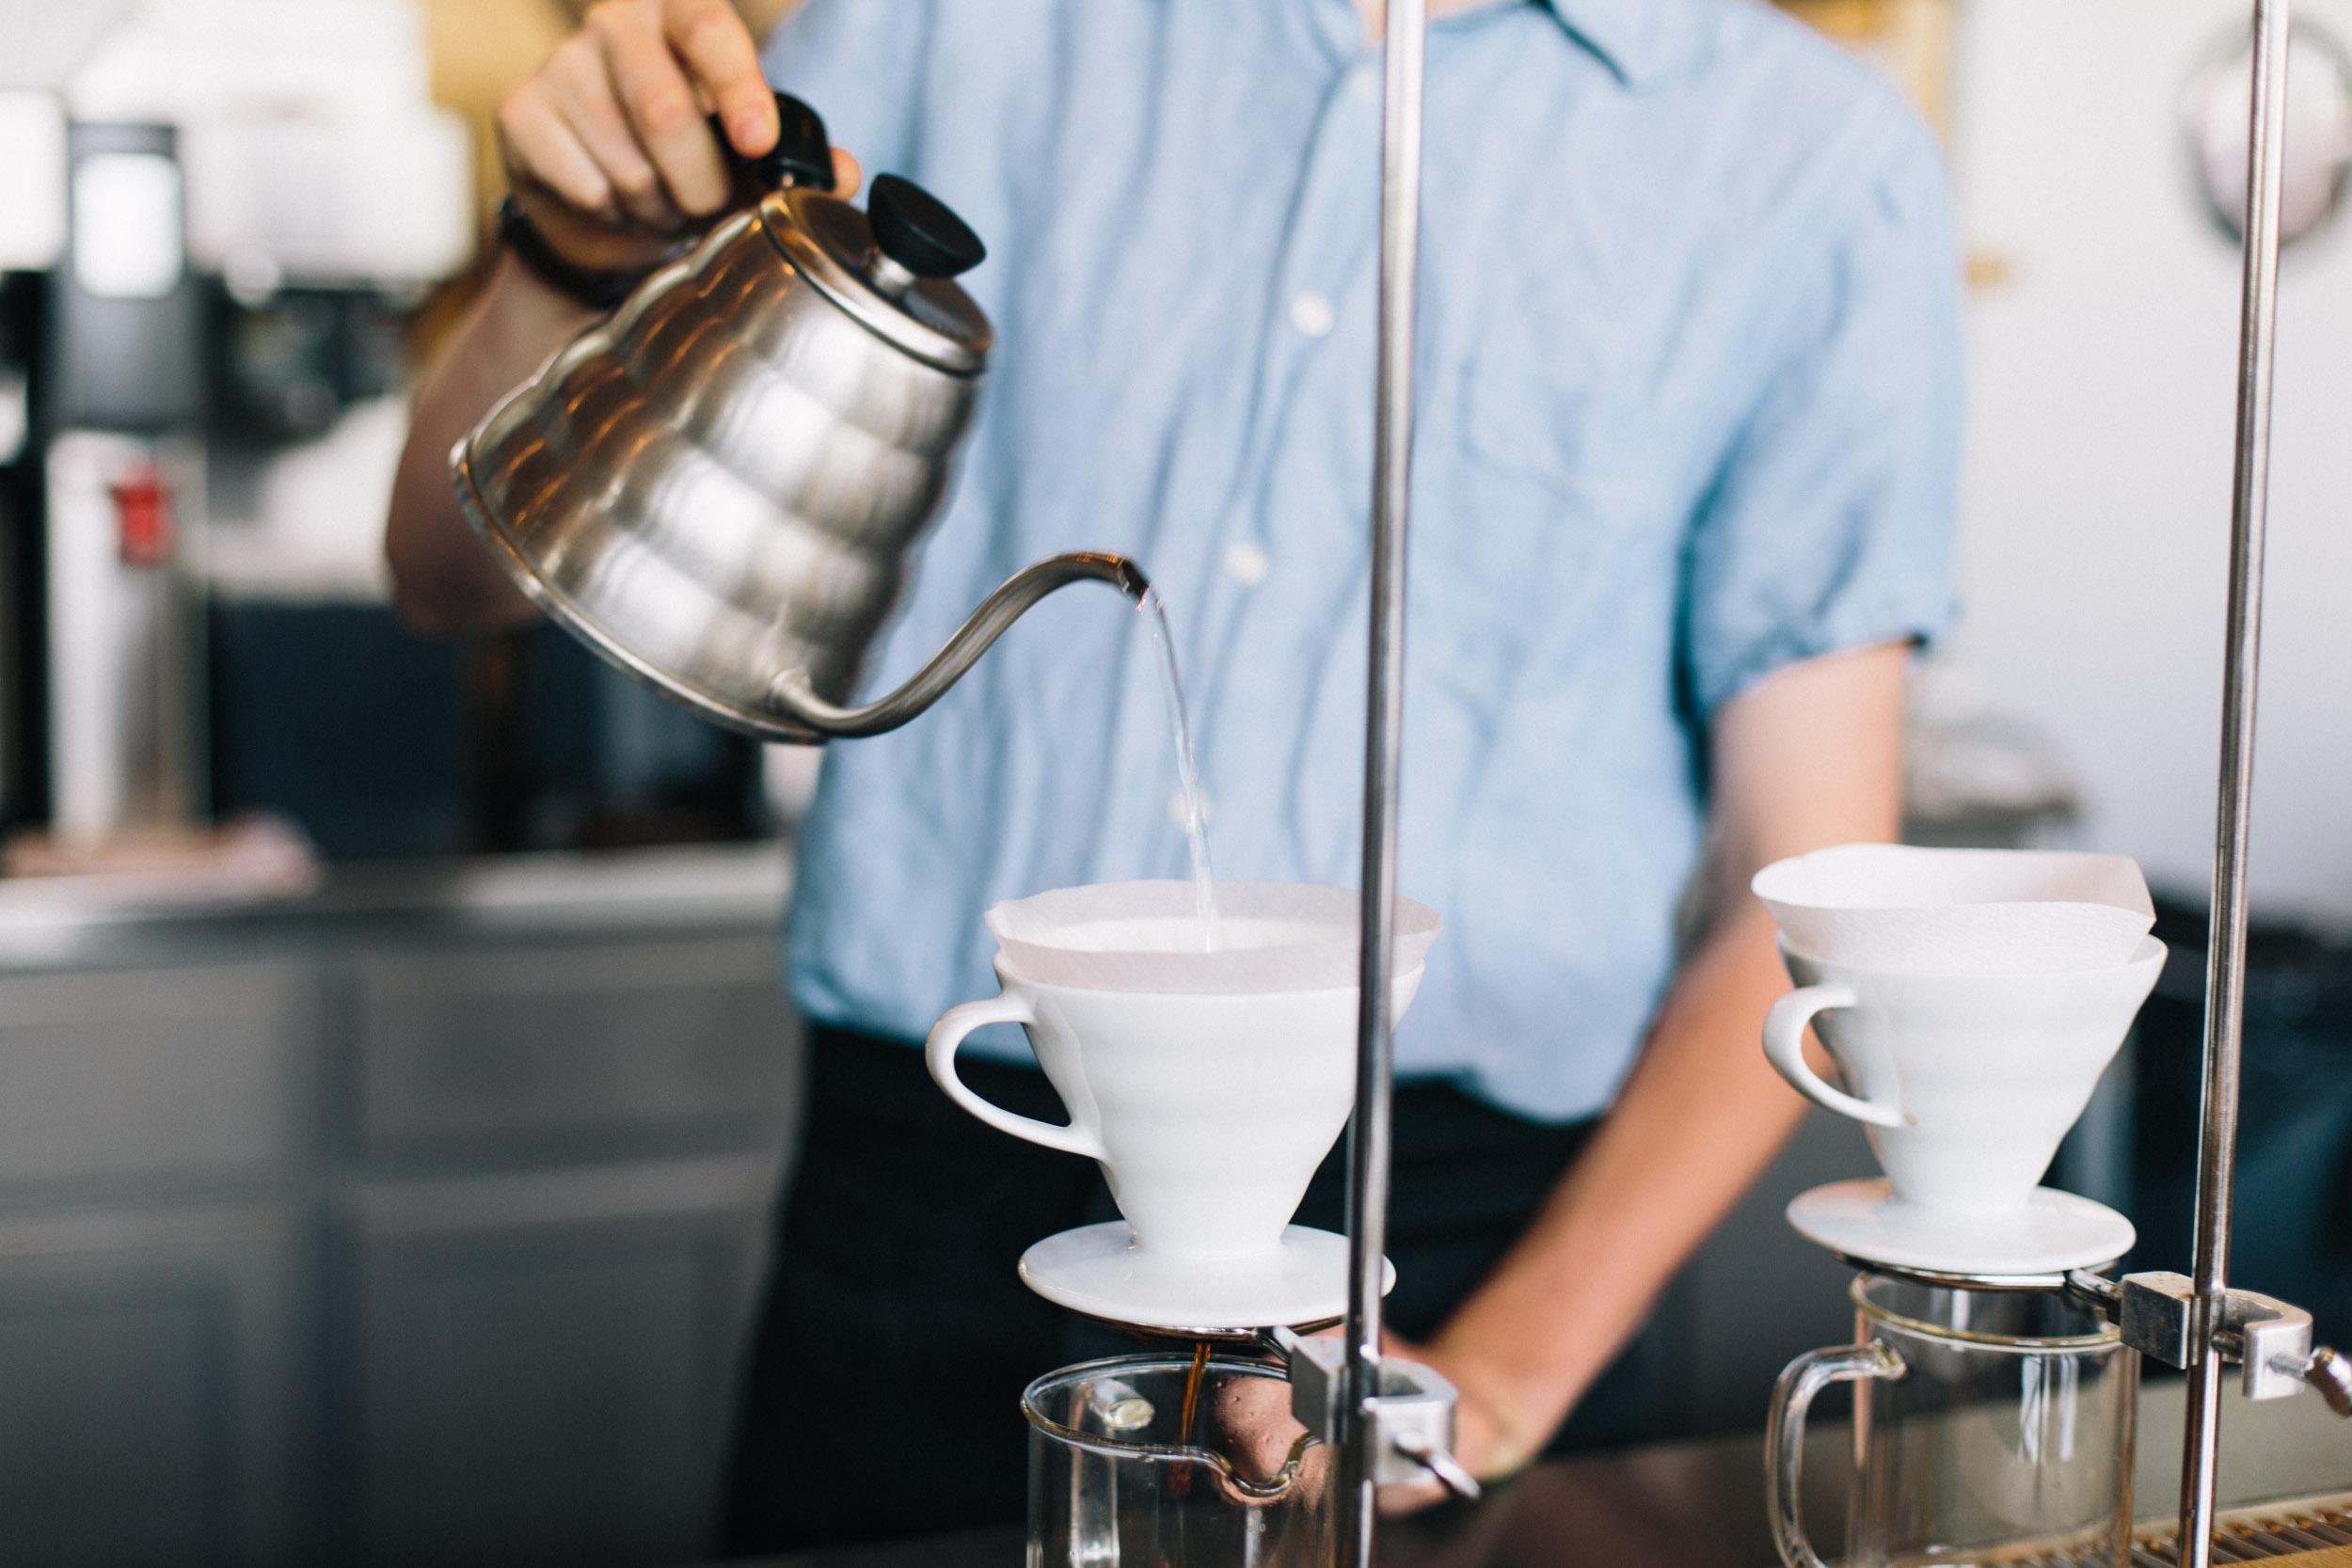 jimmy-rowalt-atlanta-coffee-food-drink-photography-038.jpg